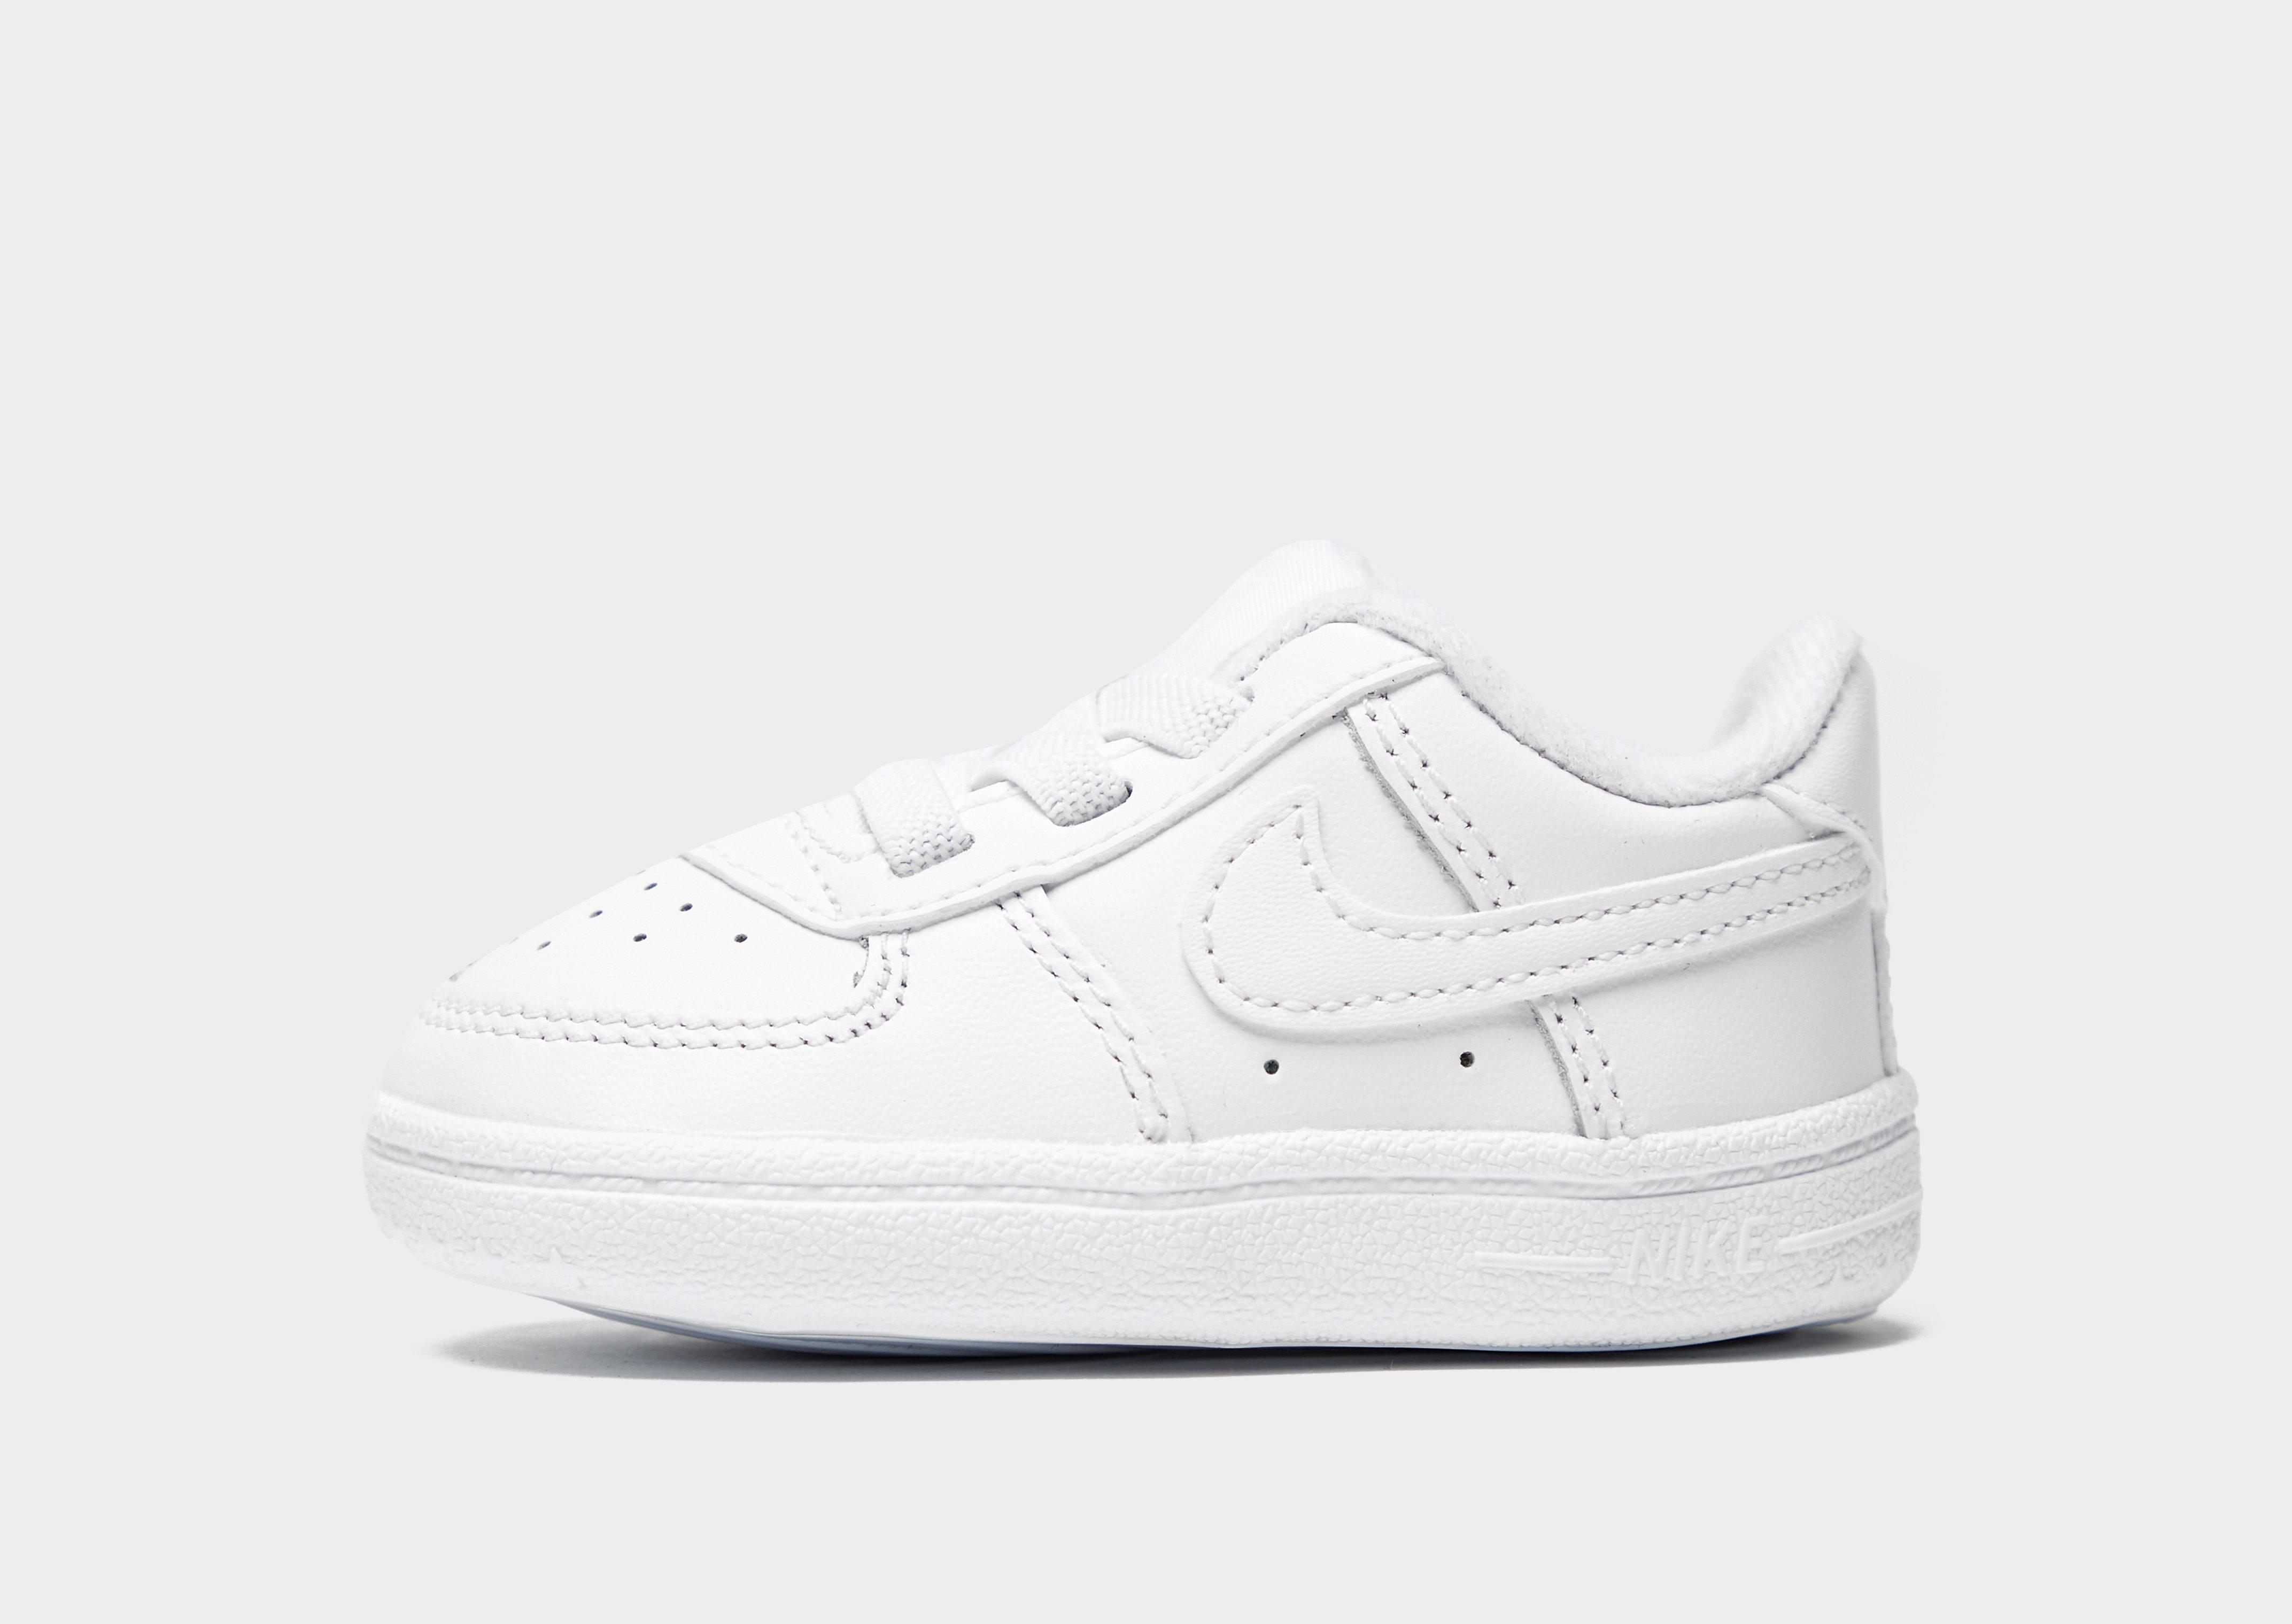 Air Jordan Babyschoenen